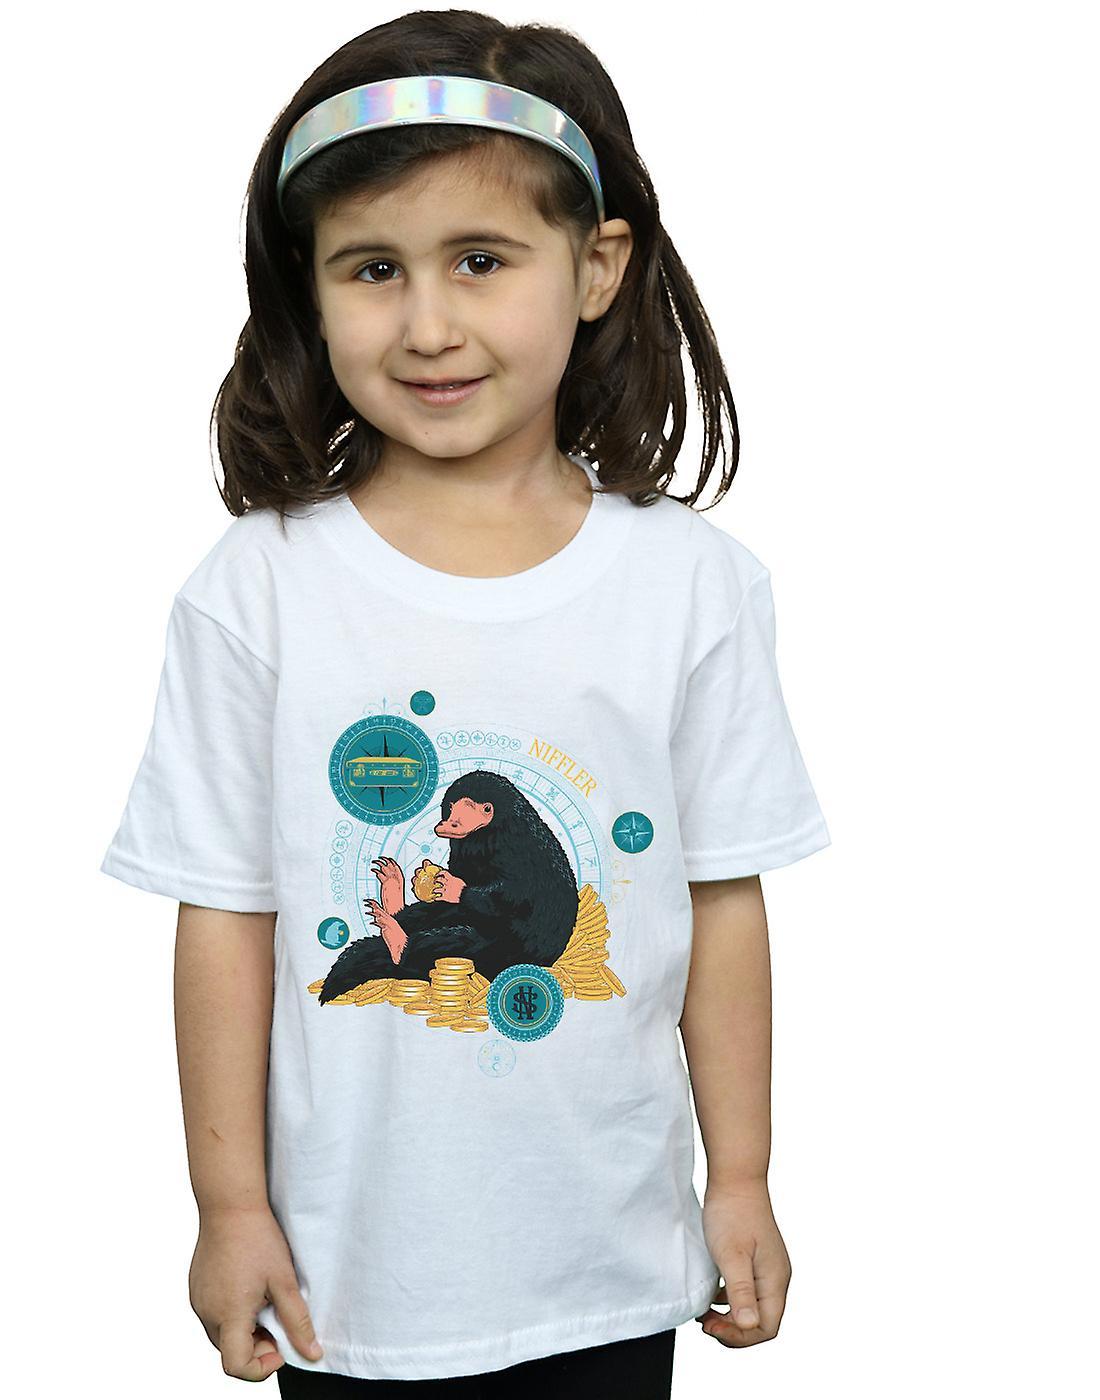 Fantastic Beasts Girls Sitting Niffler T-Shirt